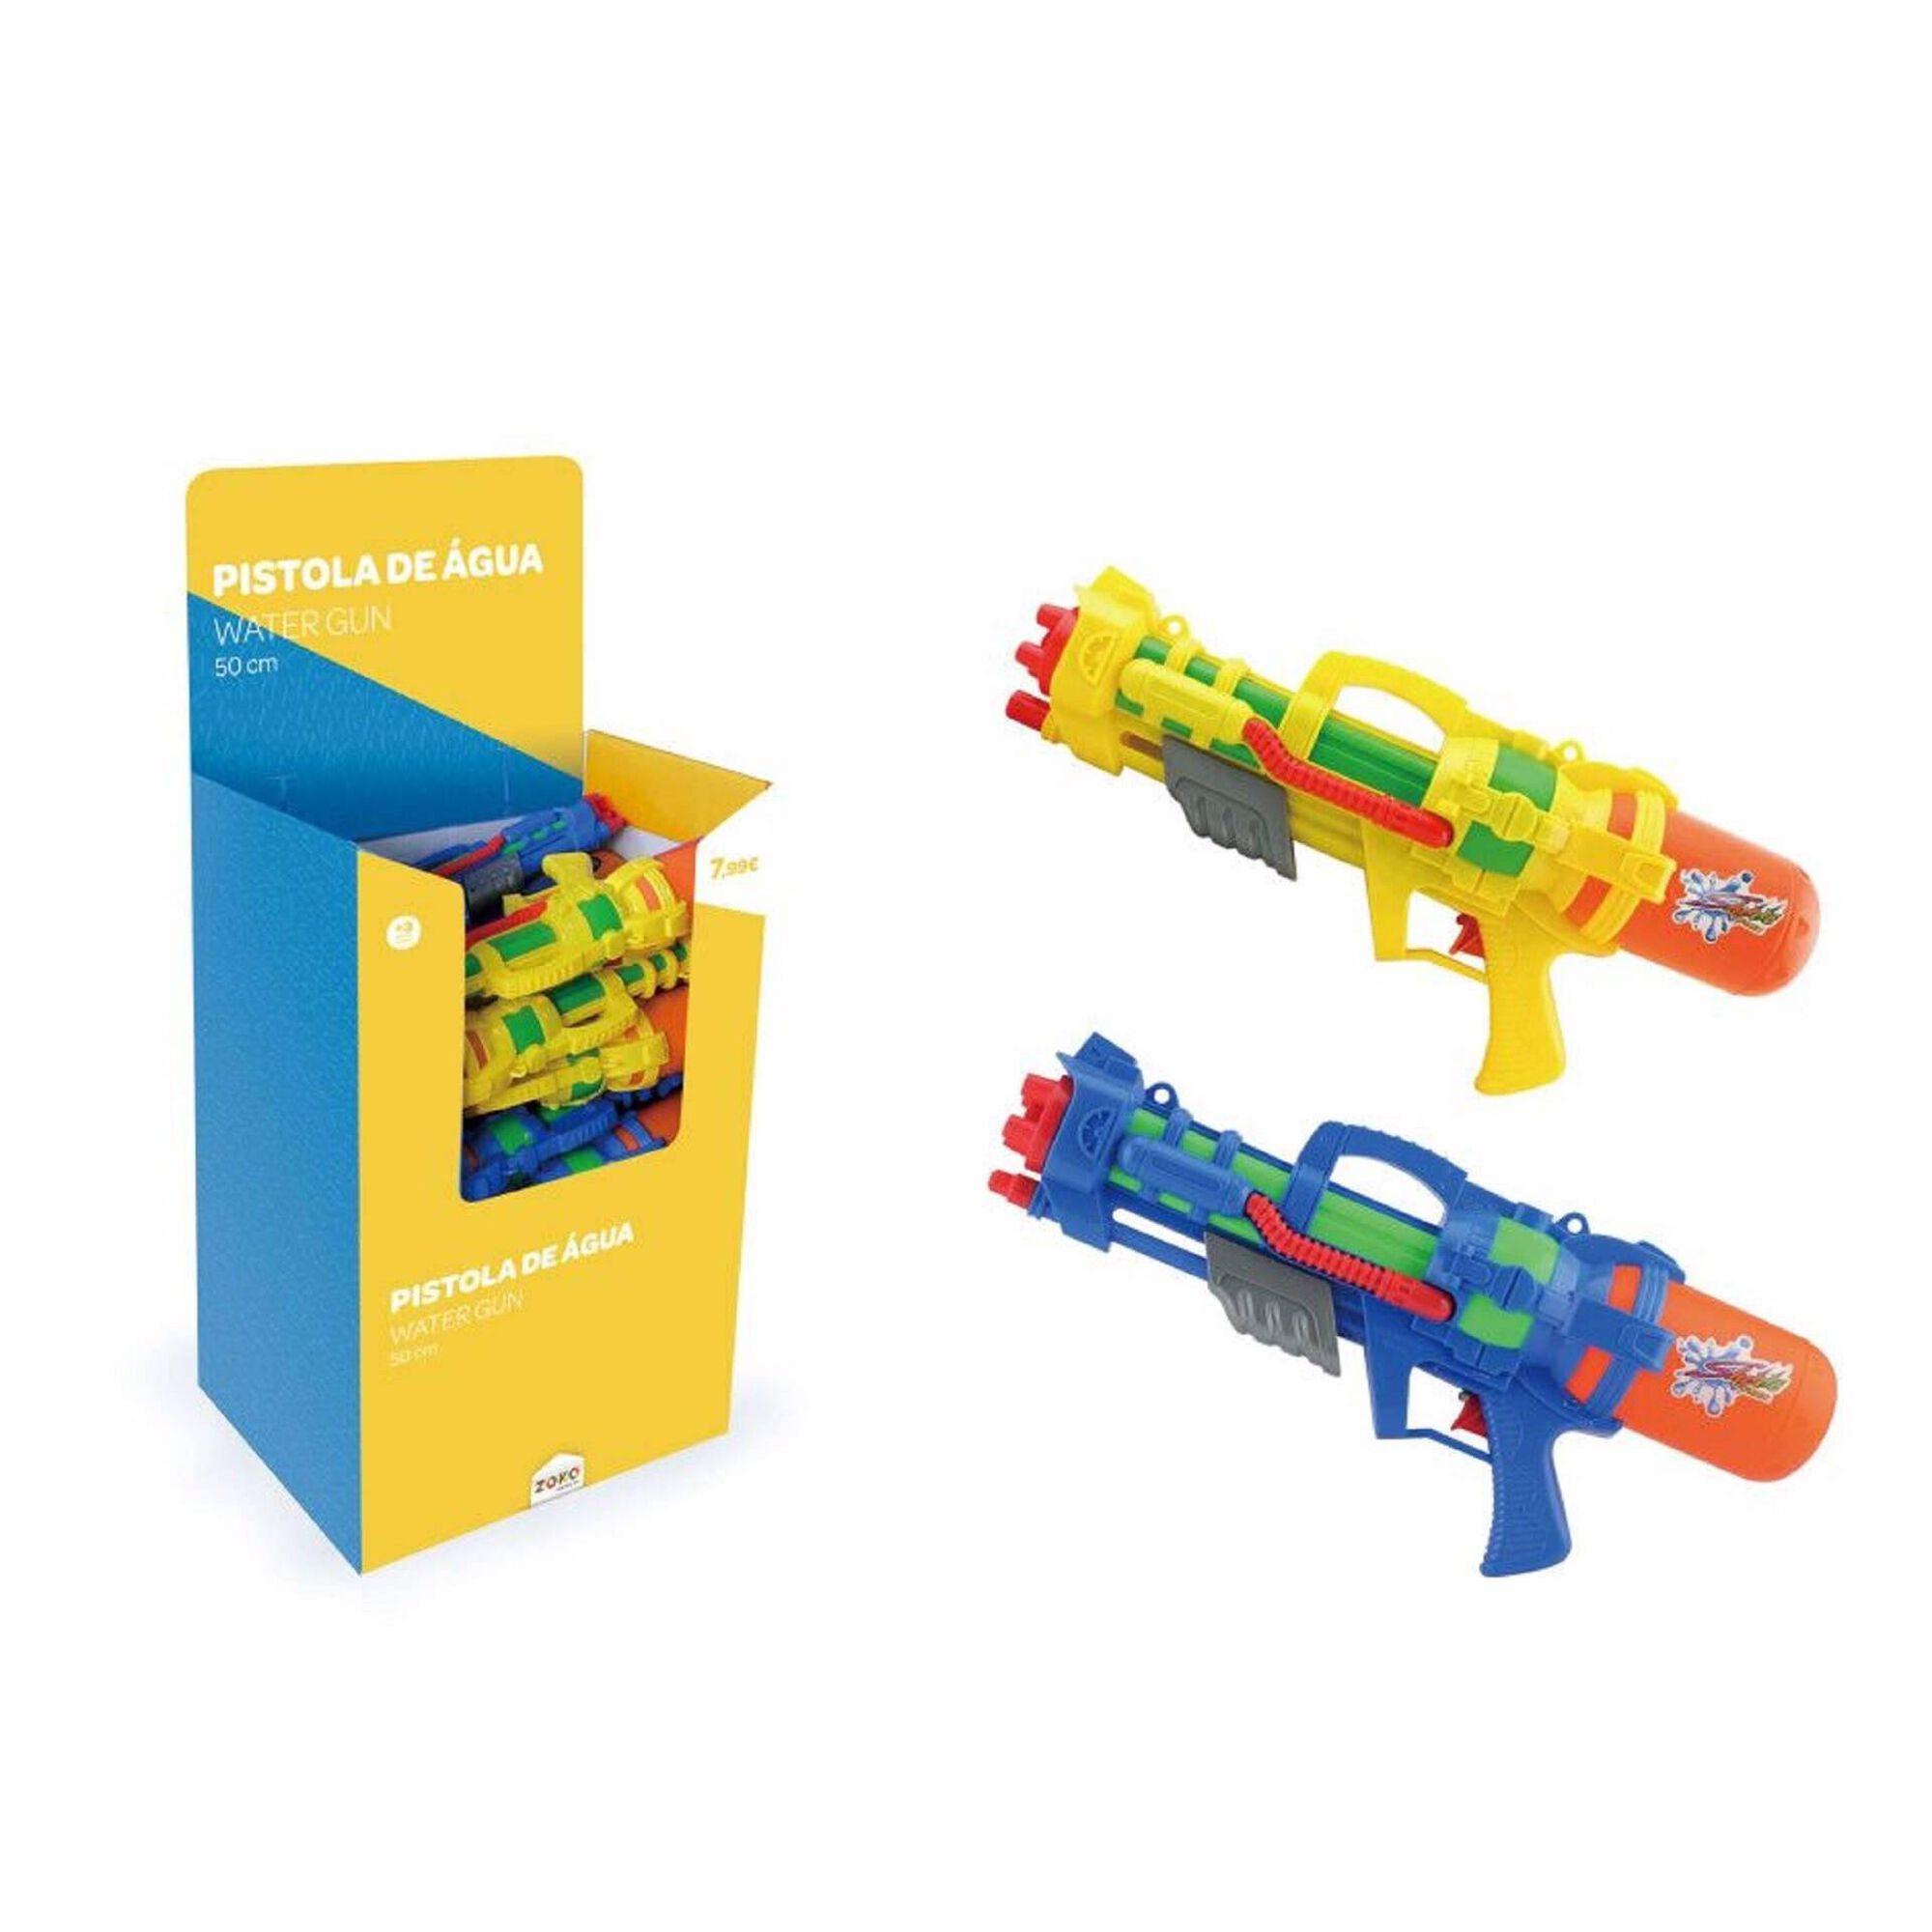 Pistola Água 50cm